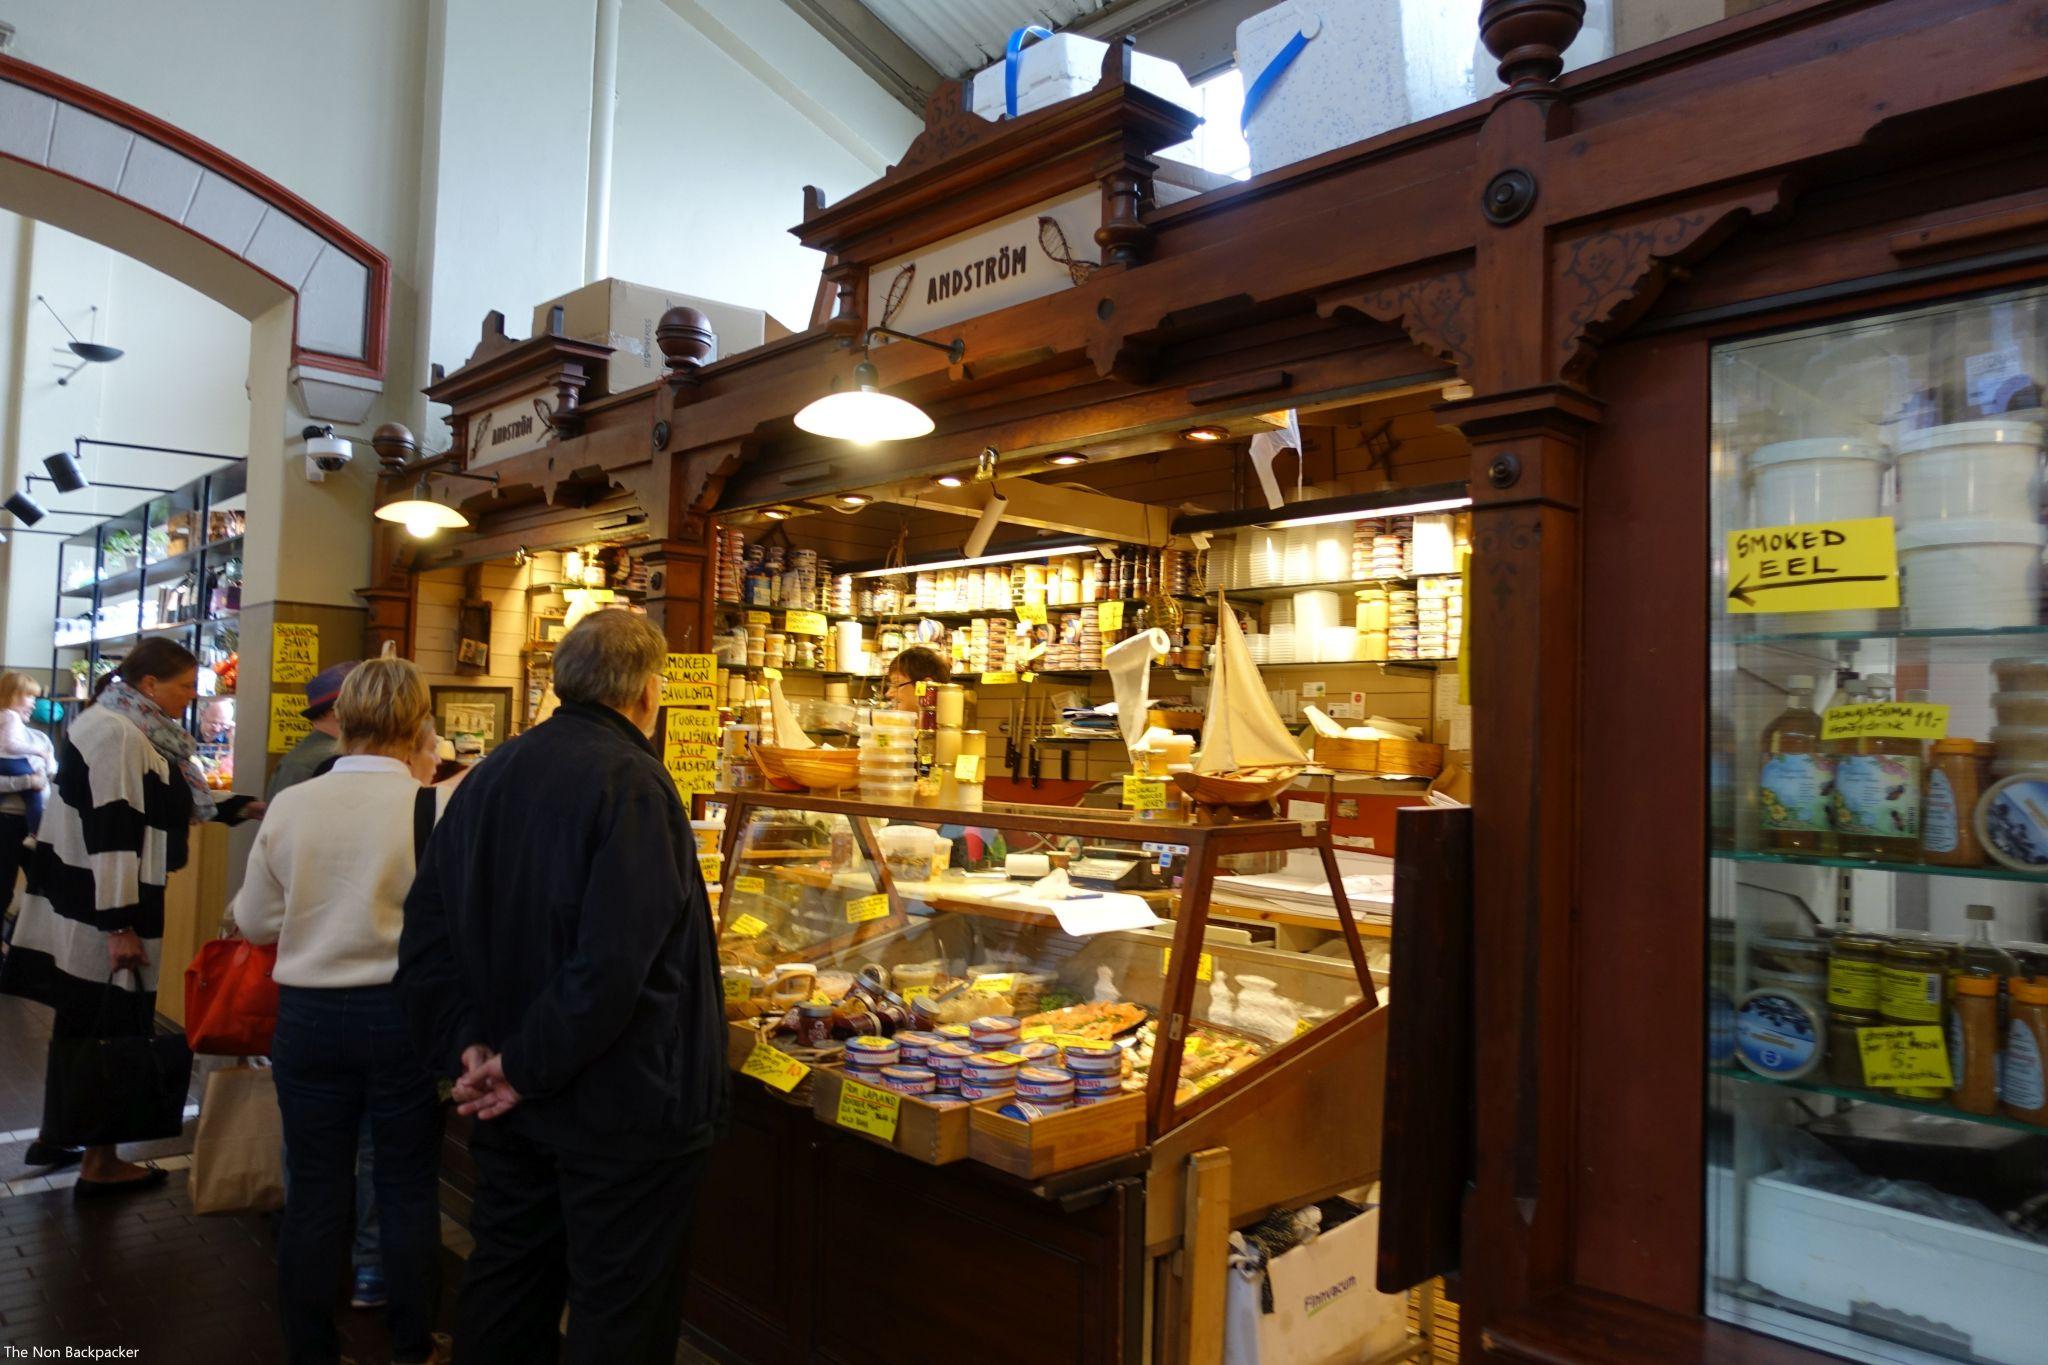 Inside the Old Market Hall